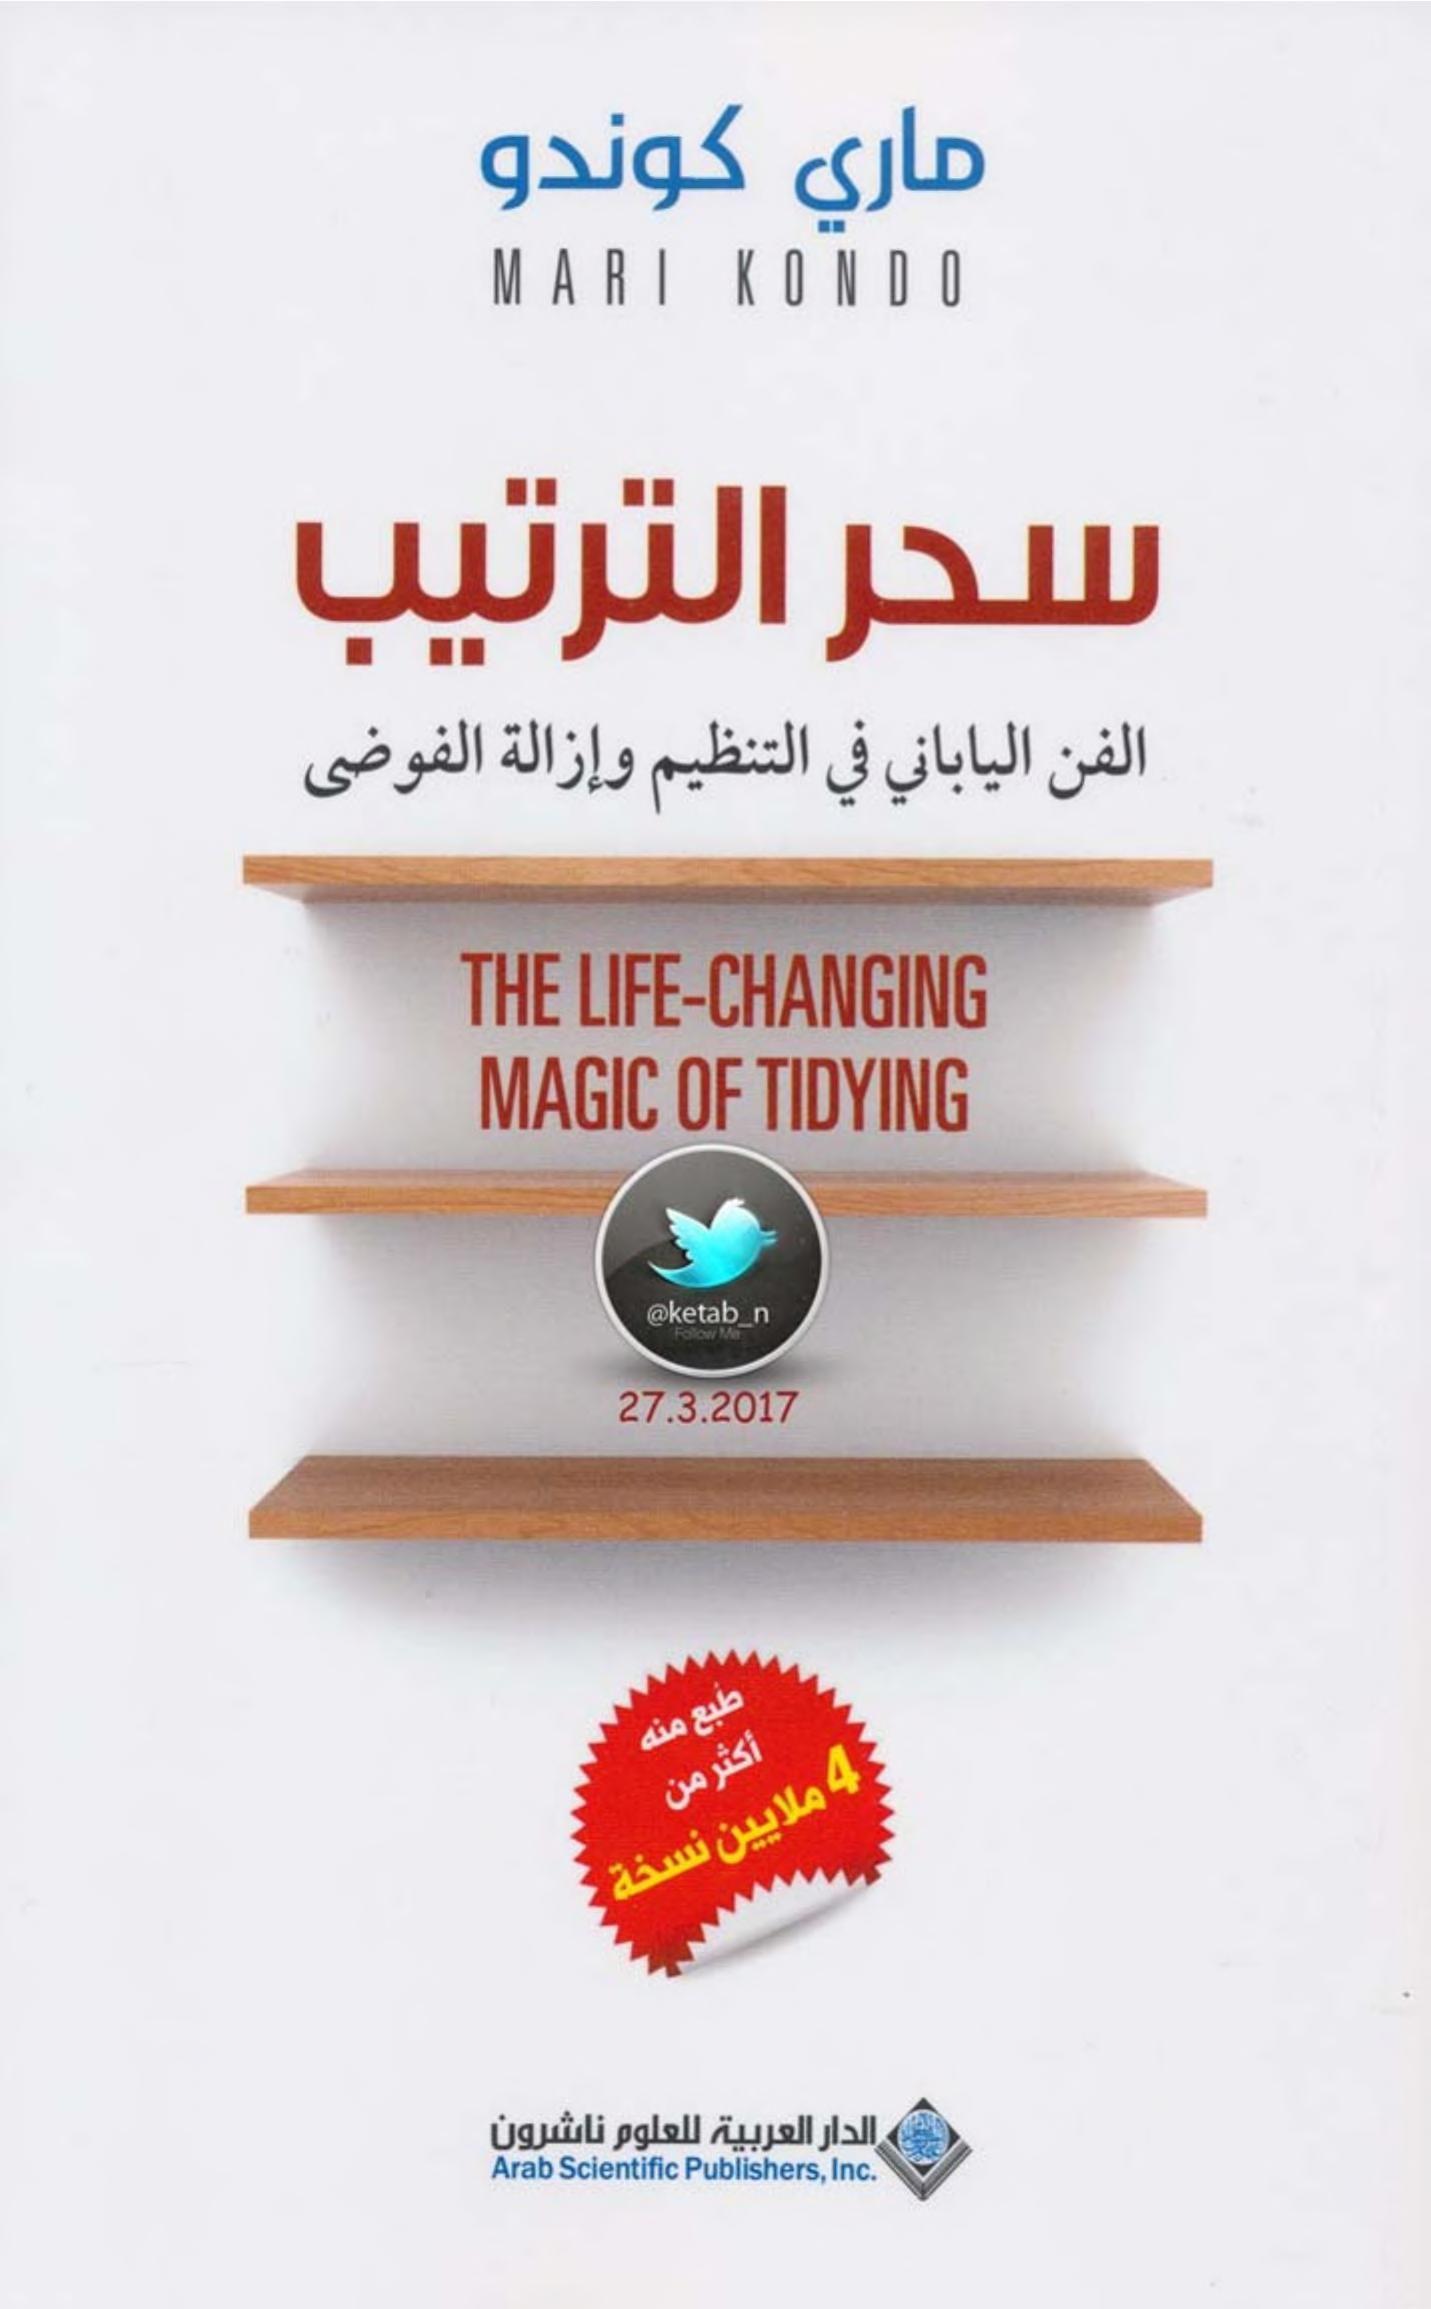 سحر الترتيب ماري كوندو Free Download Borrow And Streaming Internet Archive Arabic Books Books To Read Writing